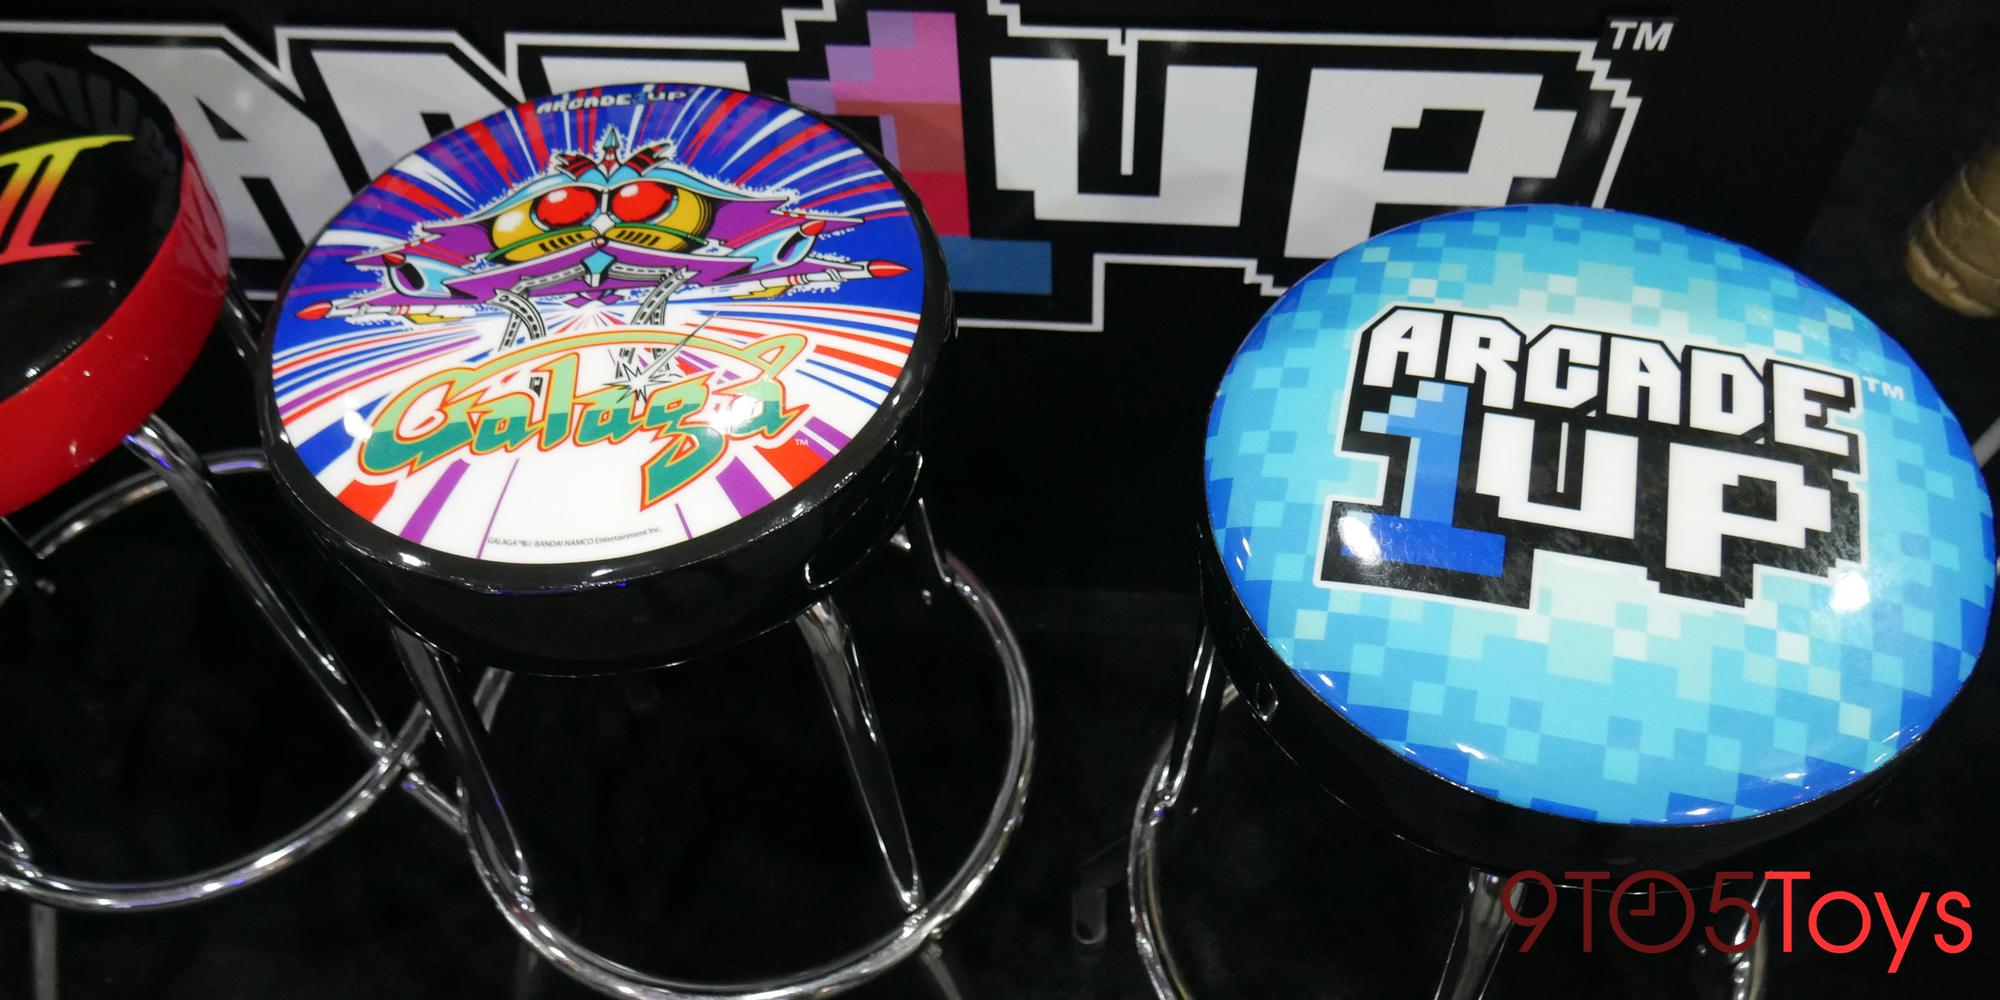 Arcade1Up Retro Stools